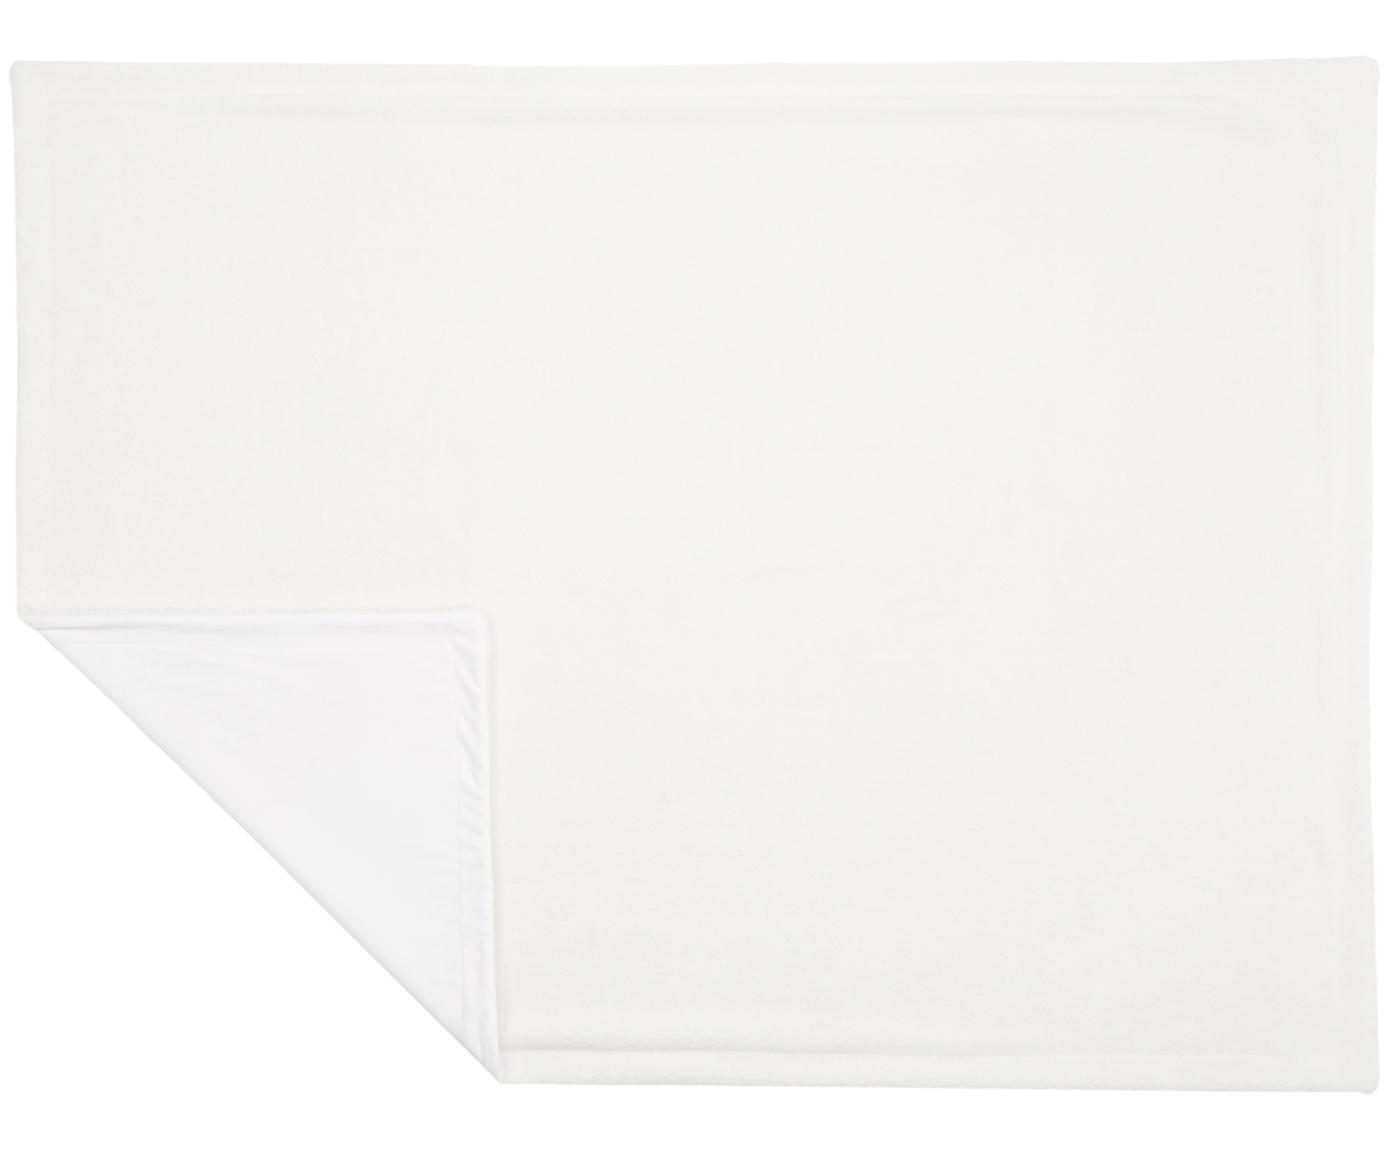 Pled Teddy Mille, Kremowy, S 150 x D 200 cm